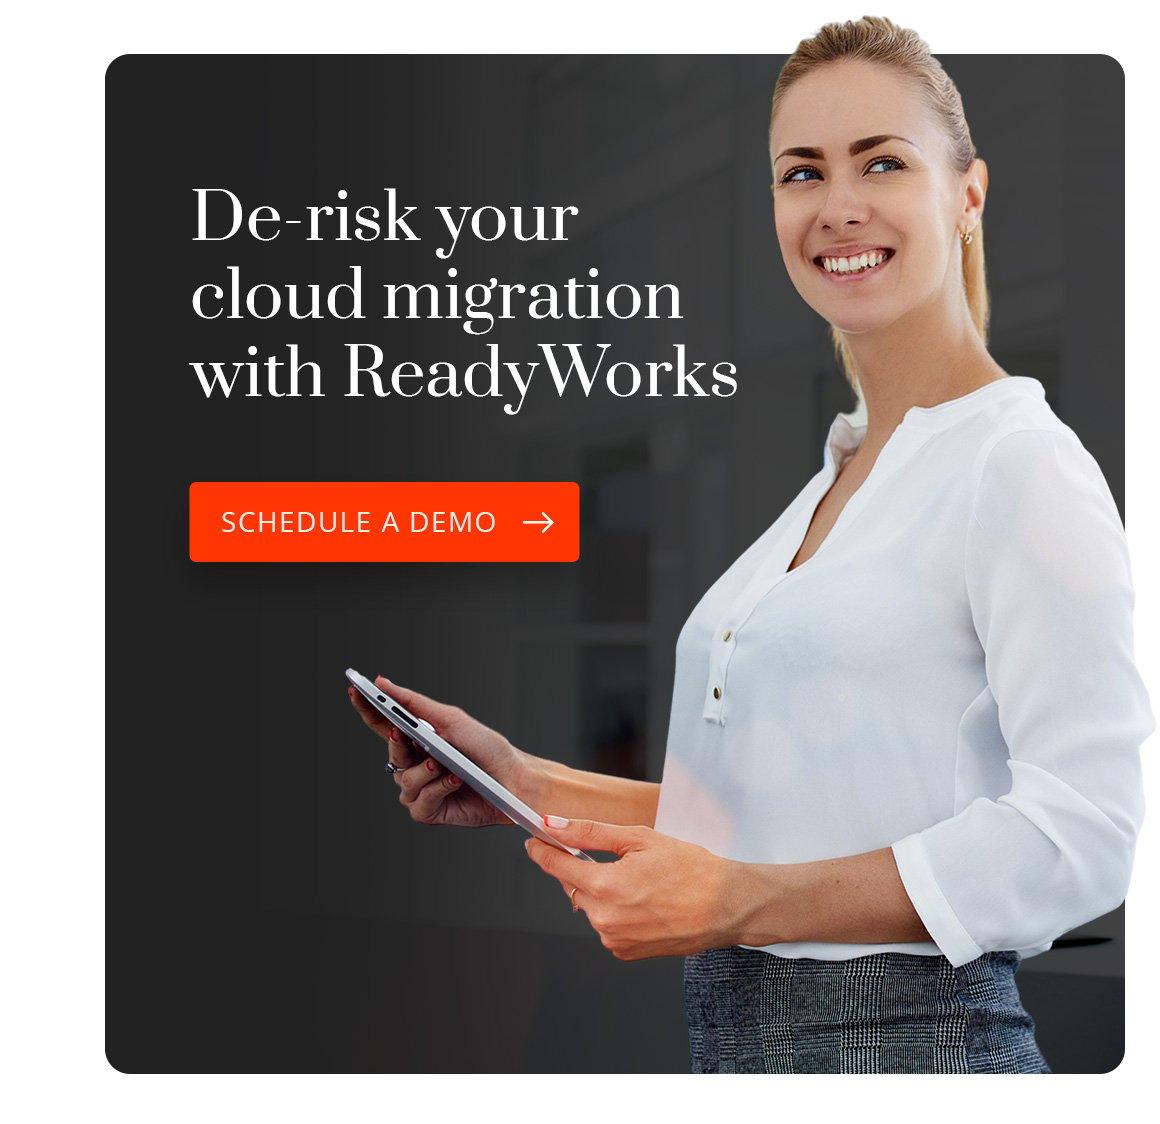 De-risk your cloud migration with ReadyWorks. Schedule a Demo.